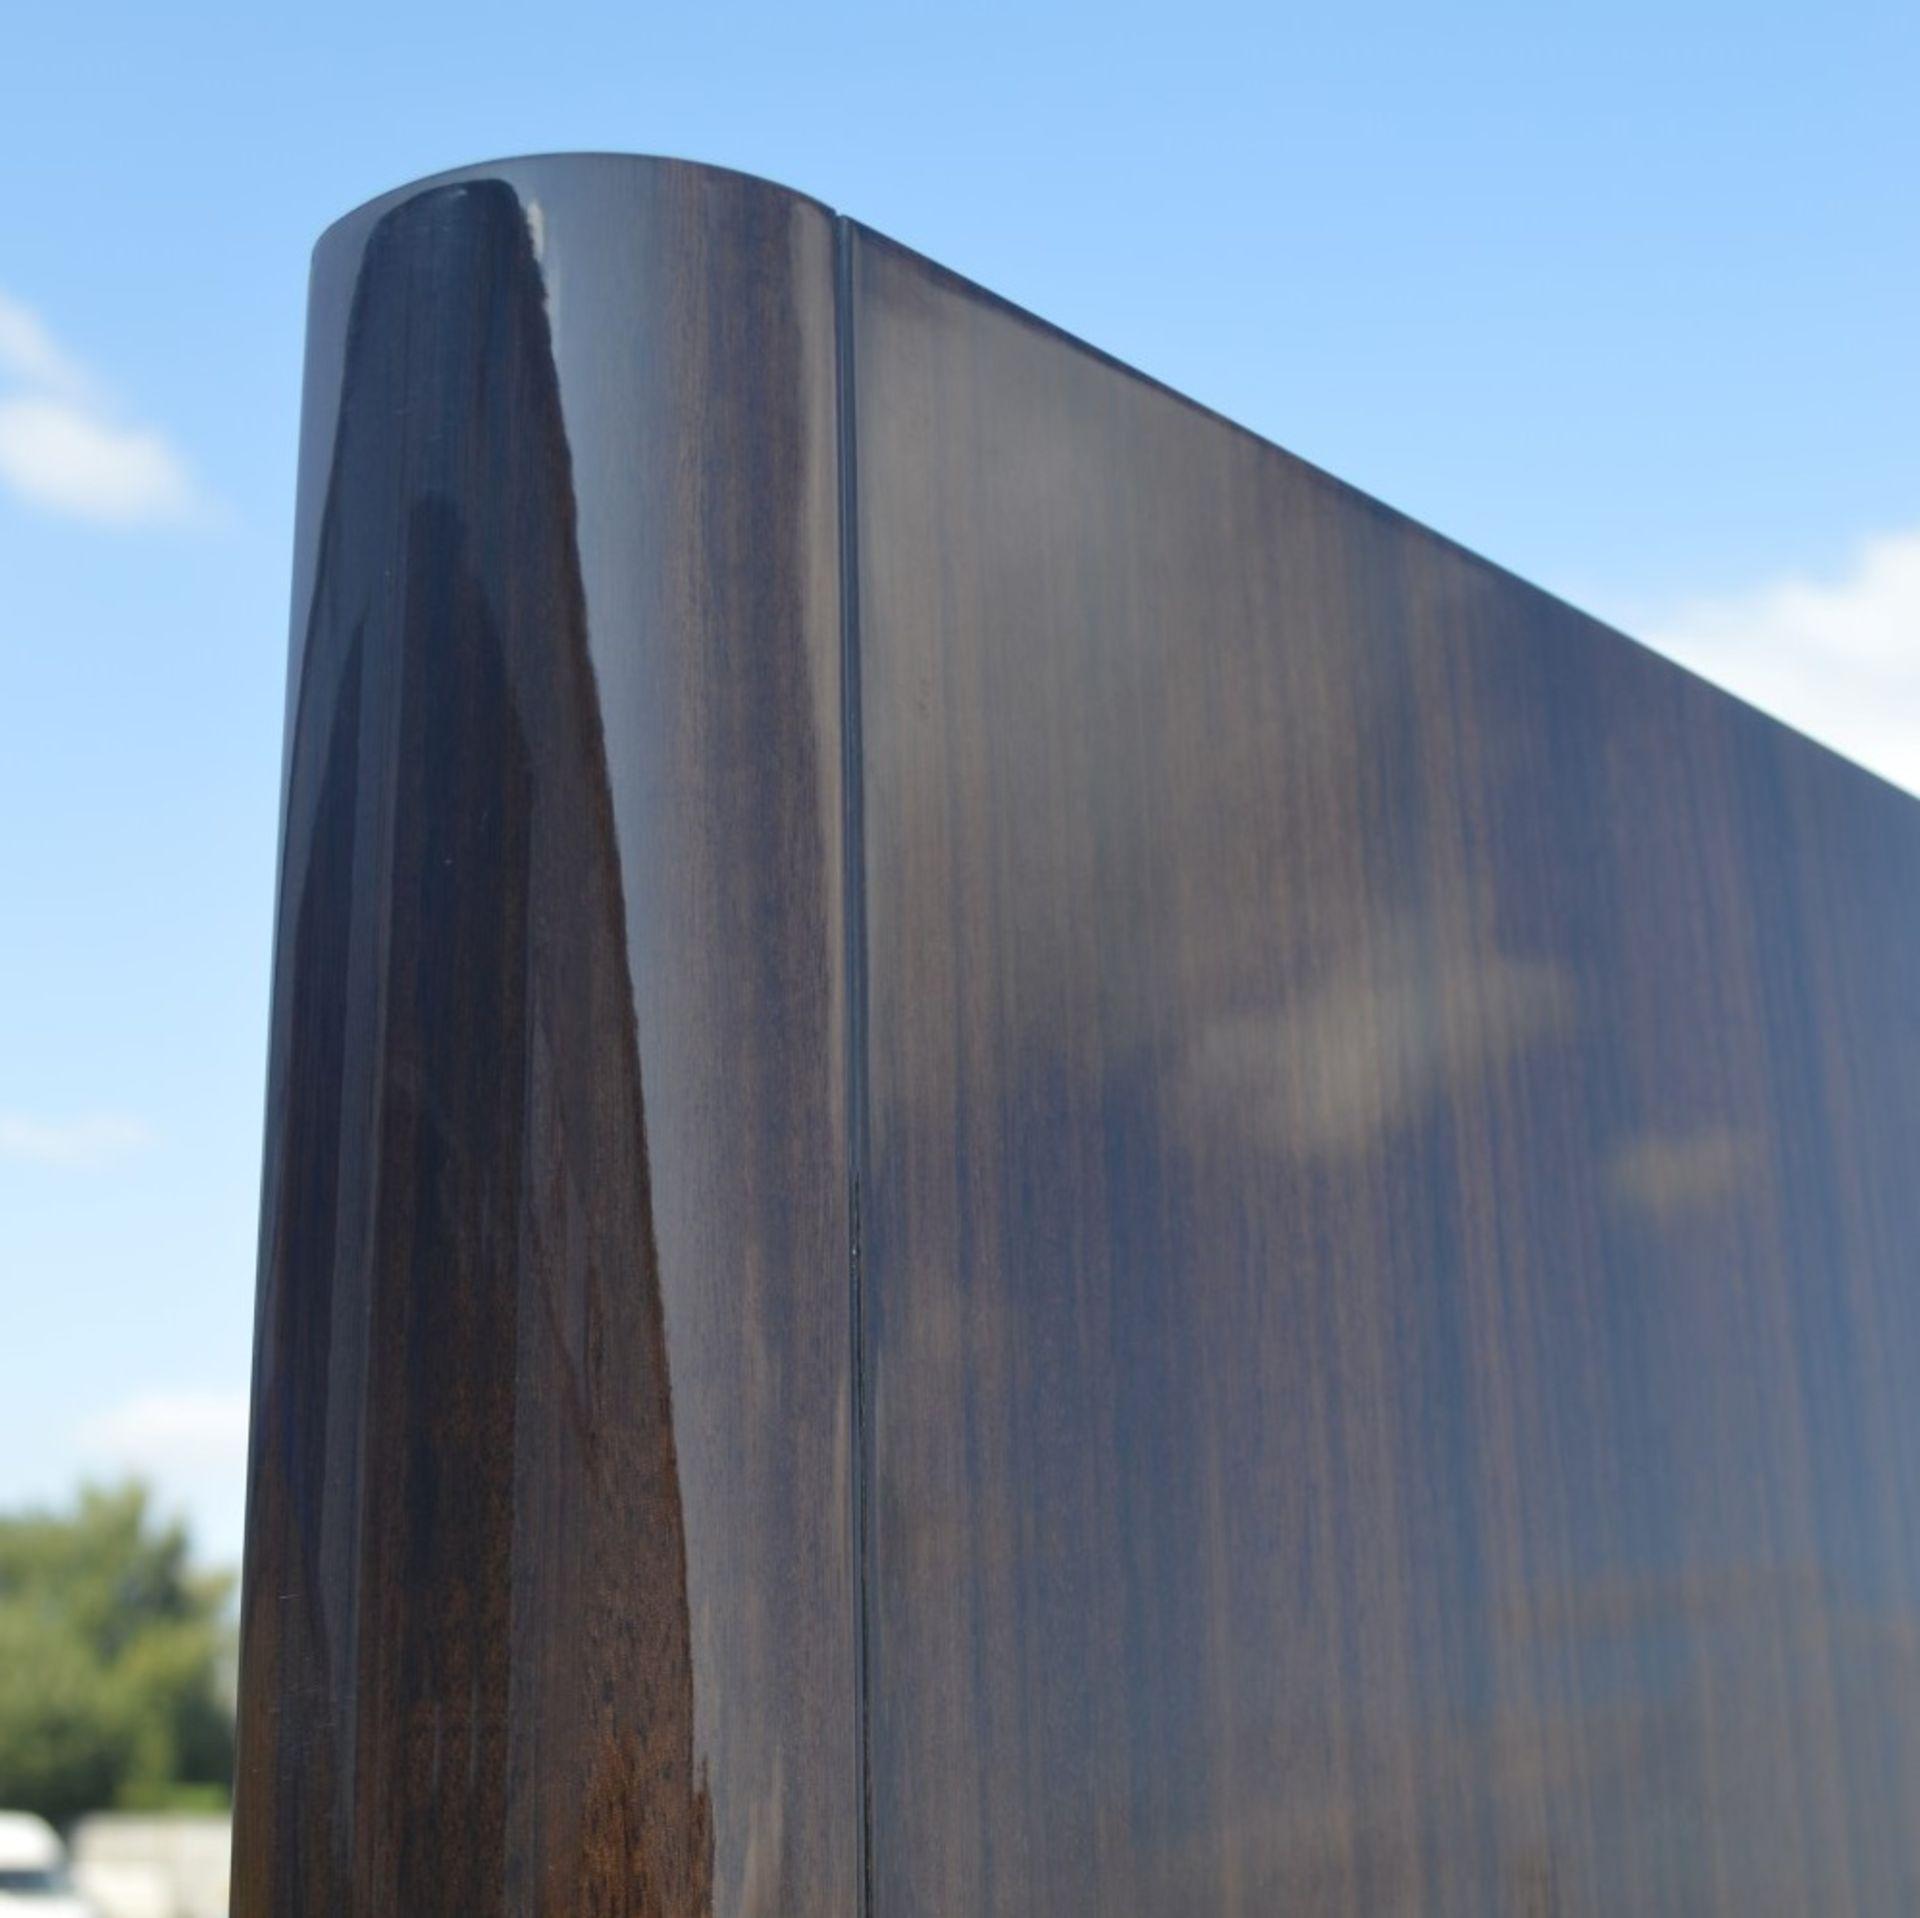 1 x FRATO Bespoke 'Siena' Wardrobe With A High Gloss Brown Wood Veneer Finish - Original RRP £18,890 - Image 19 of 21